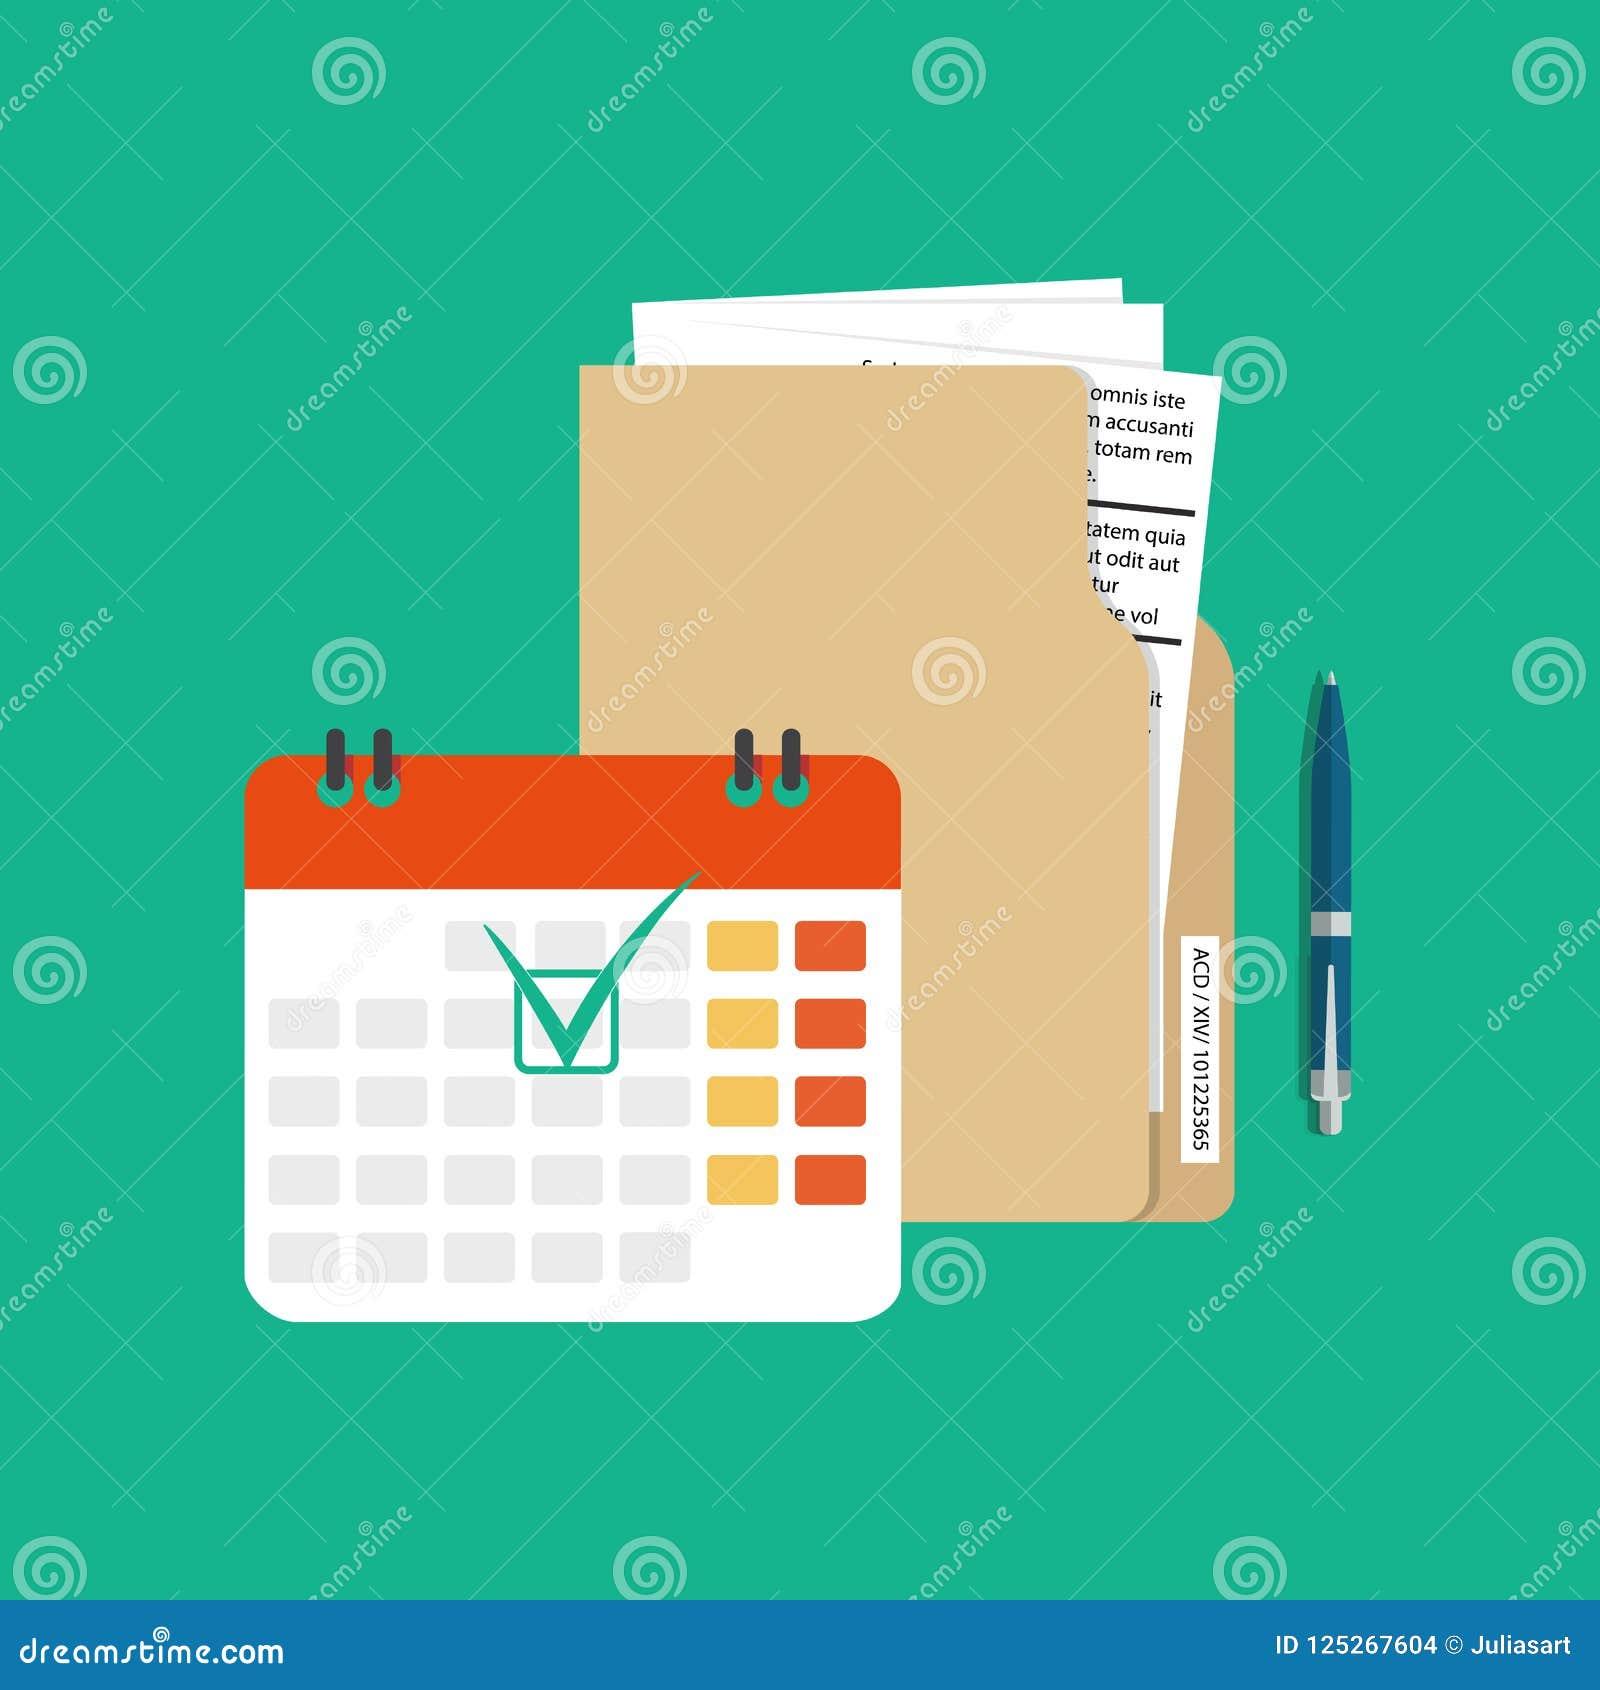 Business service concept. Vector illustration. Contract terms an. Contract terms and conditions icon. Business service concept. Vector illustration Royalty Free Illustration